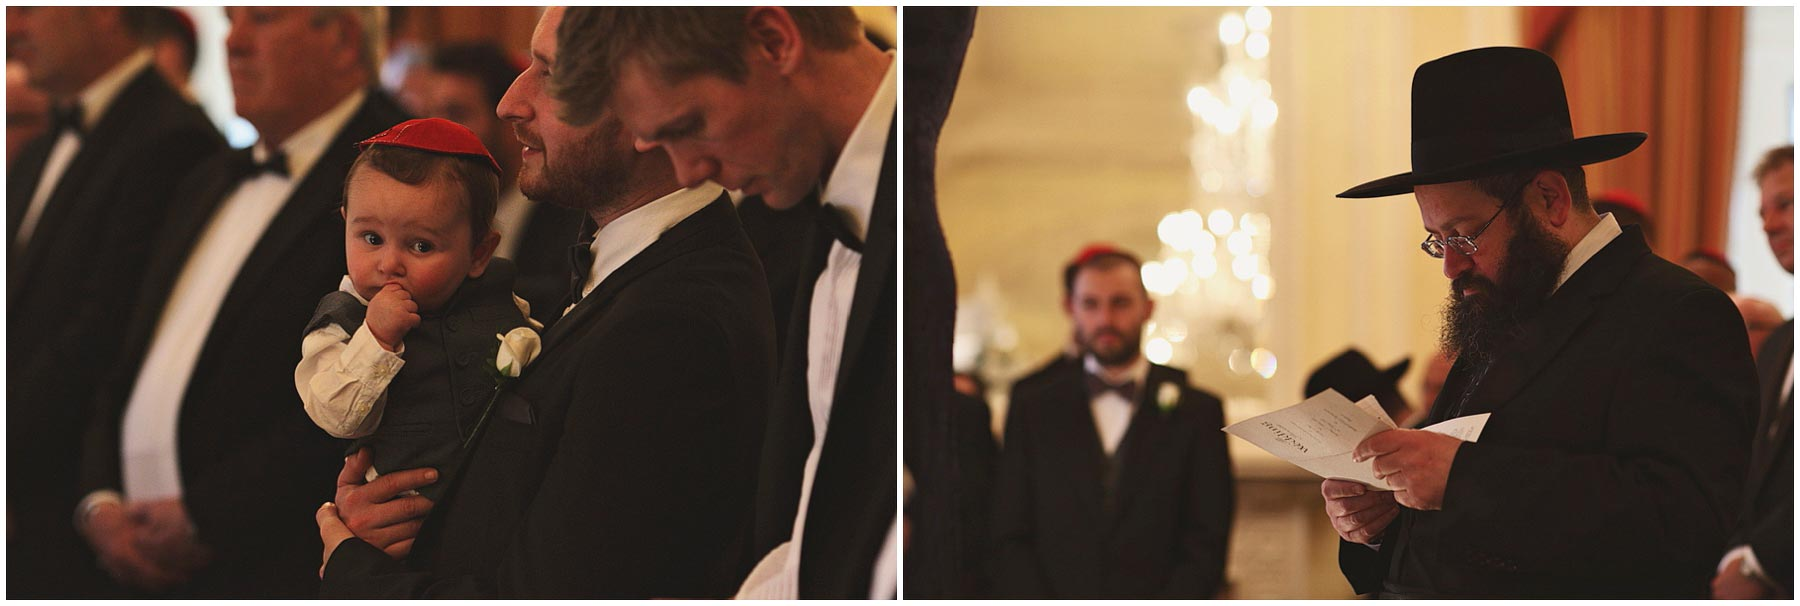 Jewish-Wedding-Photography_0068